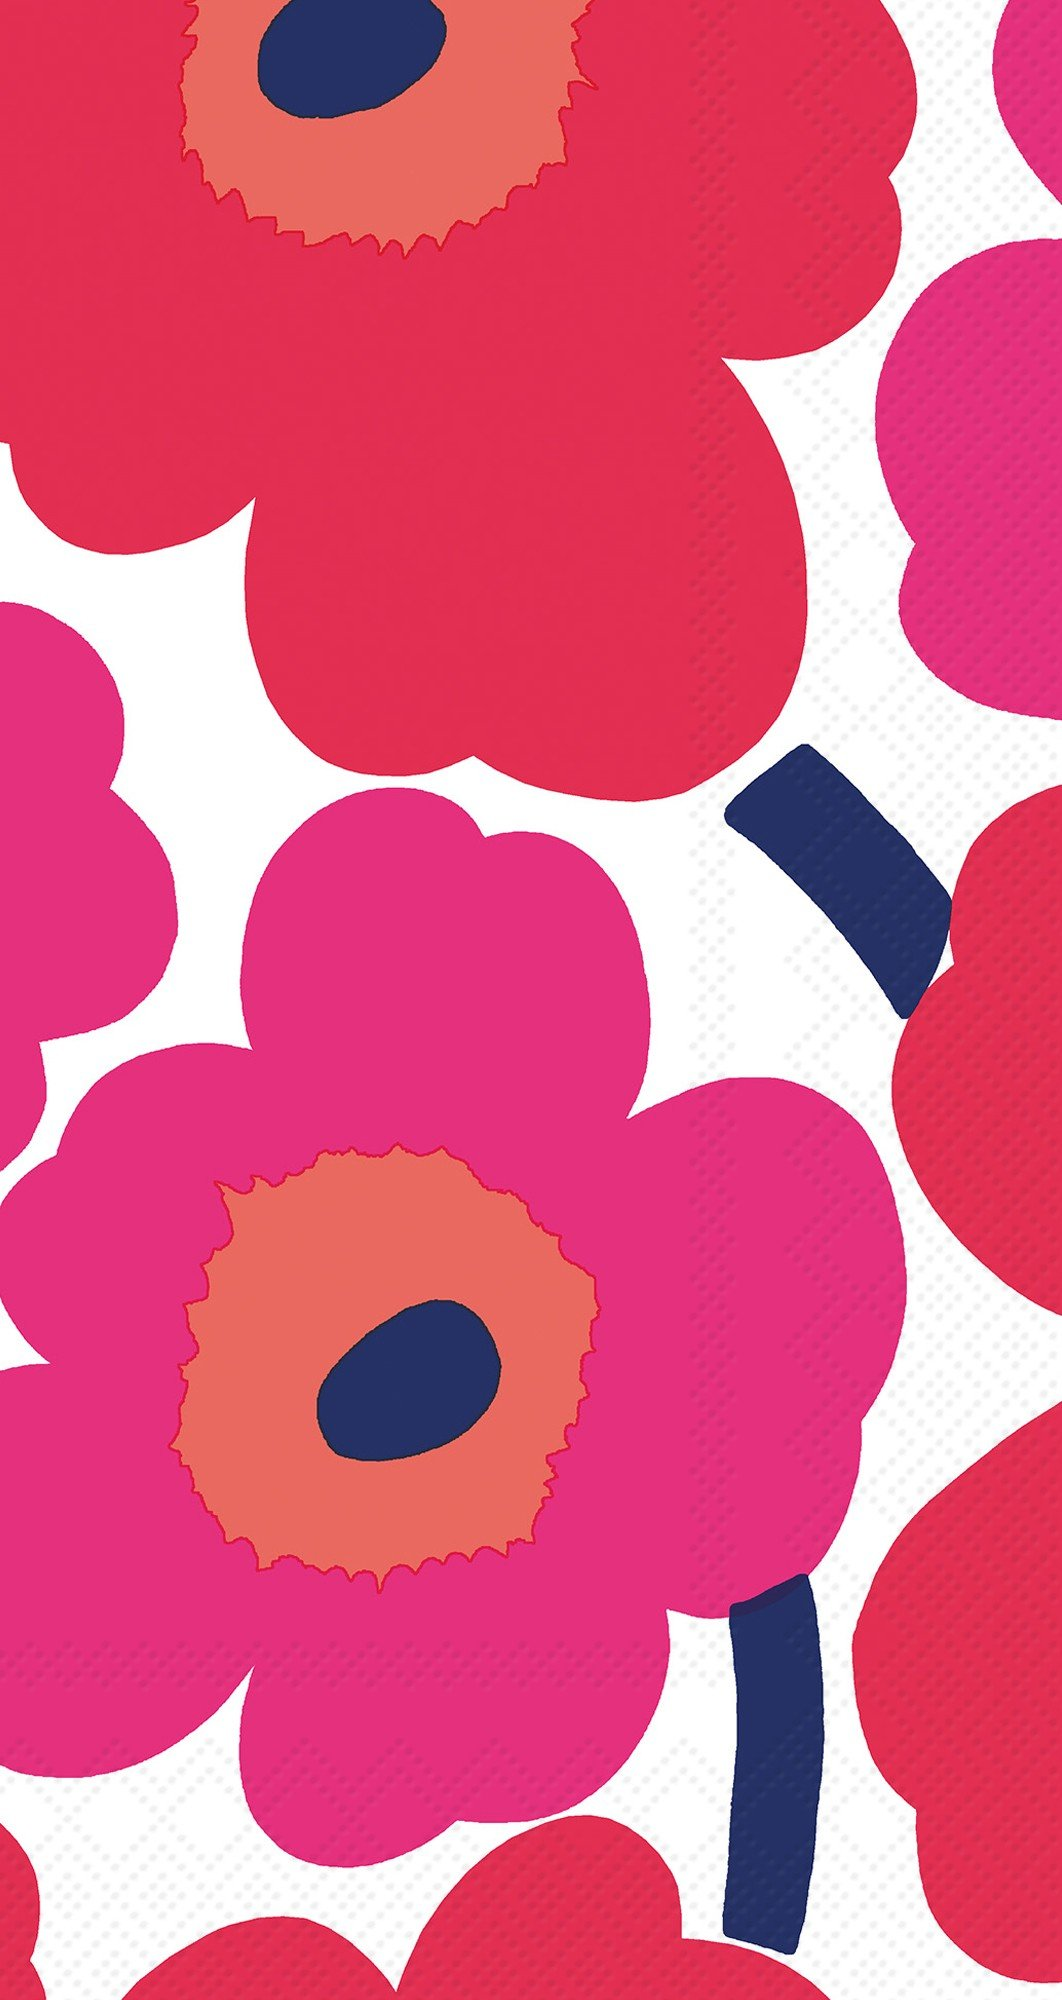 Ideal Home Range 32 Count 3-Ply Paper Guest Towel Napkins, Marimekko Collection (Unikko Red)